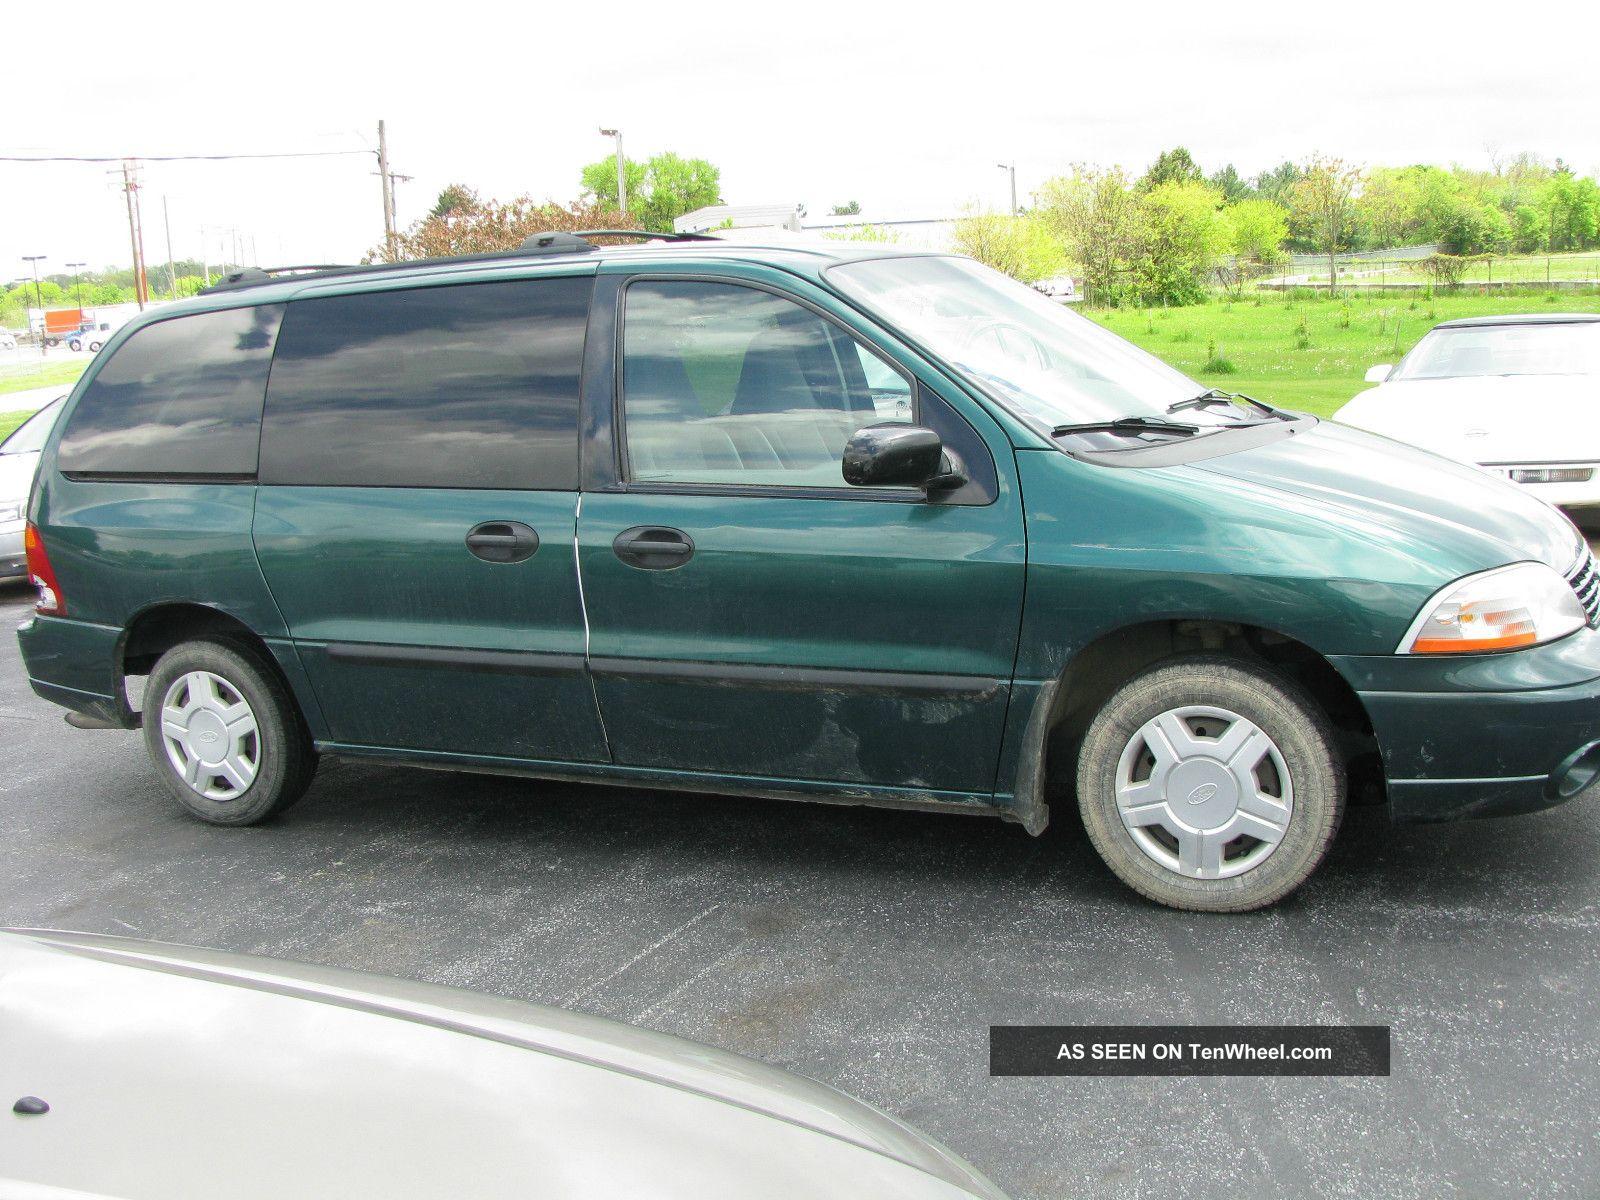 2003 ford windstar lx mini van 7 passenger 4 door great for wheelchair lift. Black Bedroom Furniture Sets. Home Design Ideas